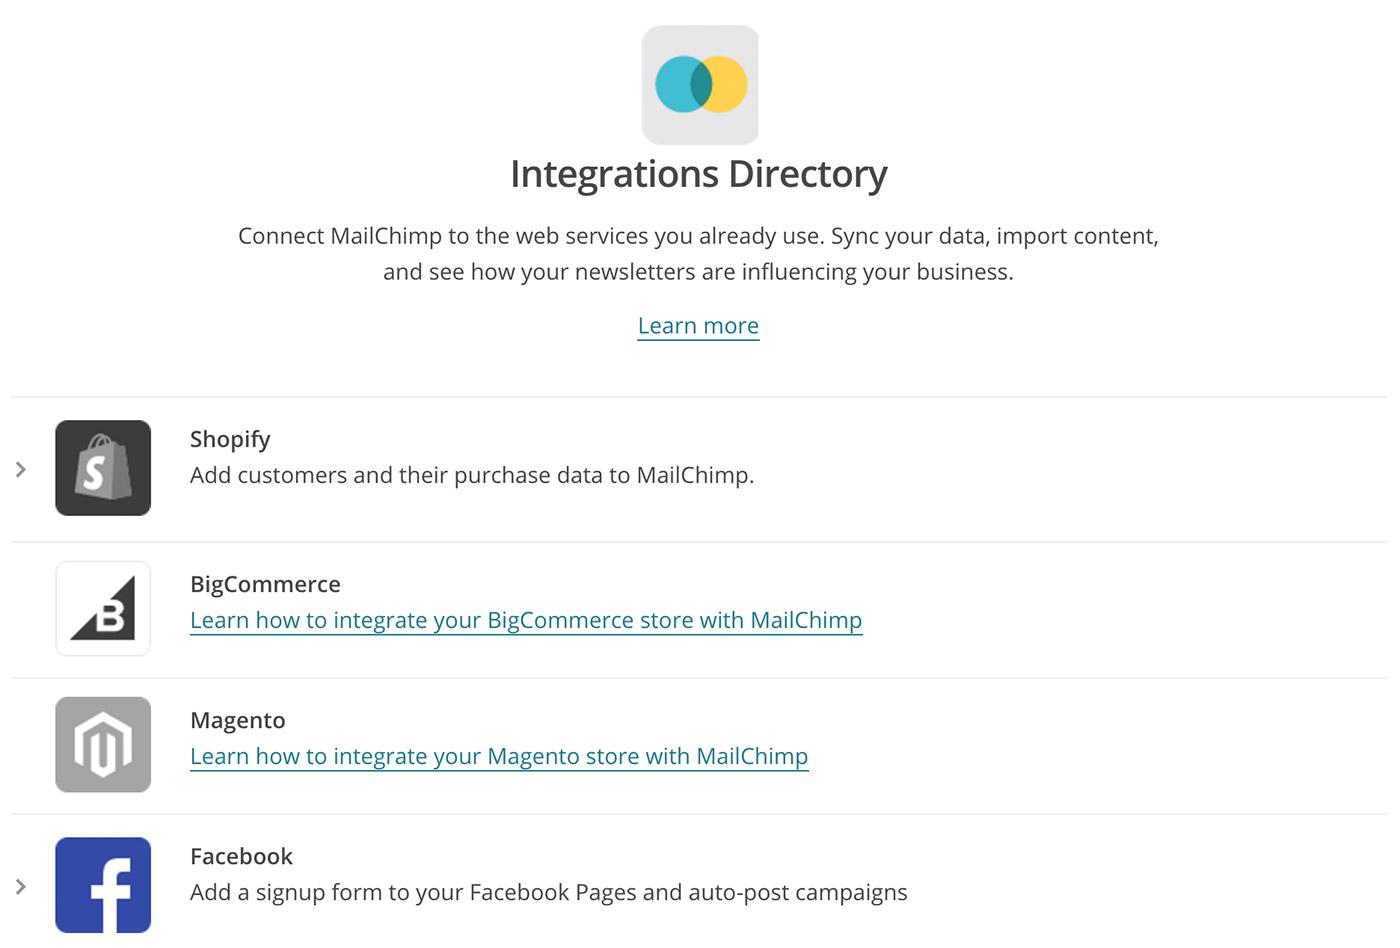 mailchimp-facebook-integration-02